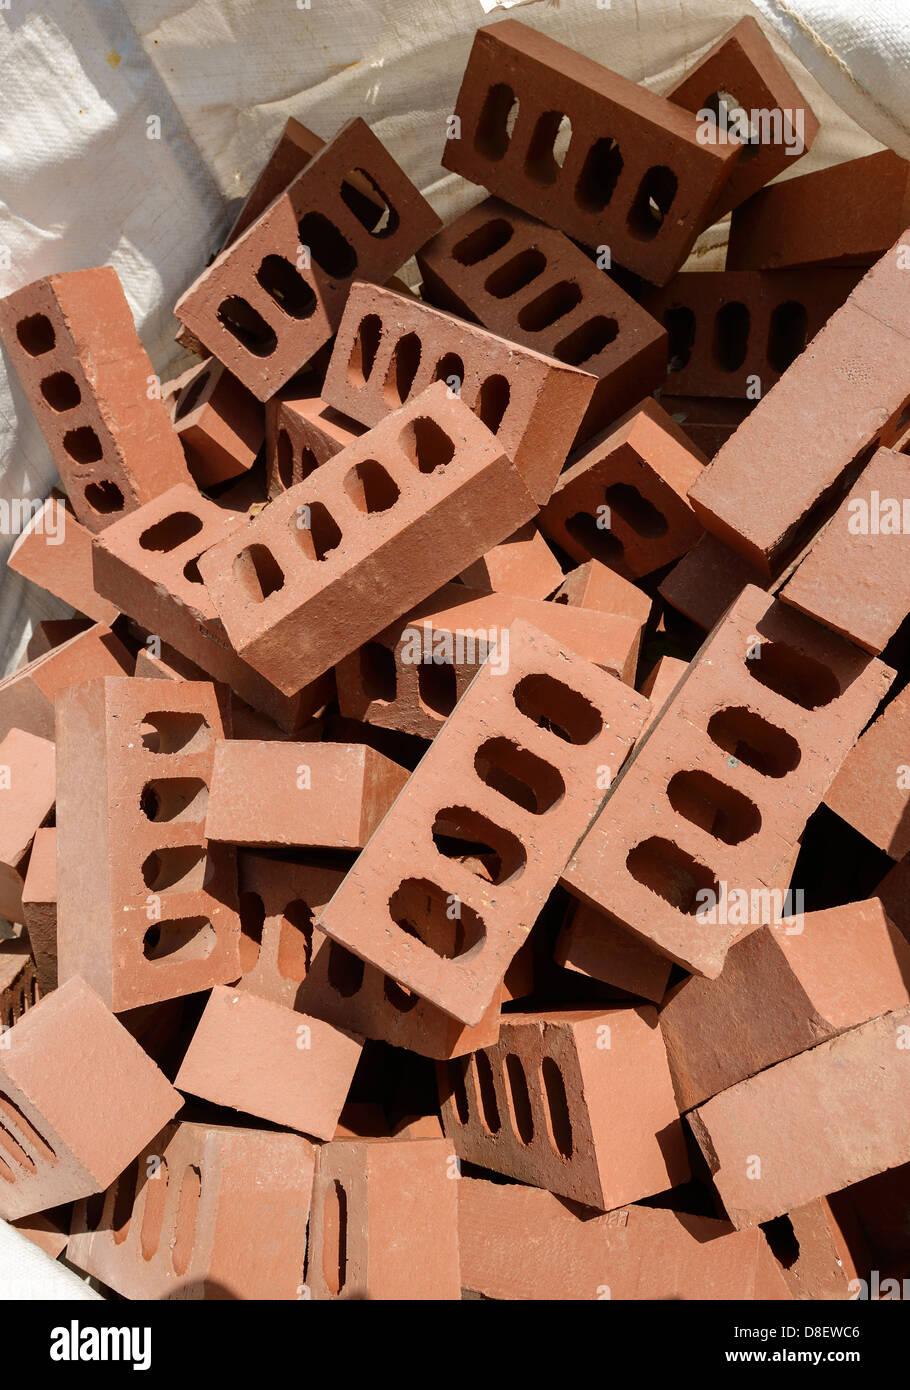 Bag of house bricks - Stock Image